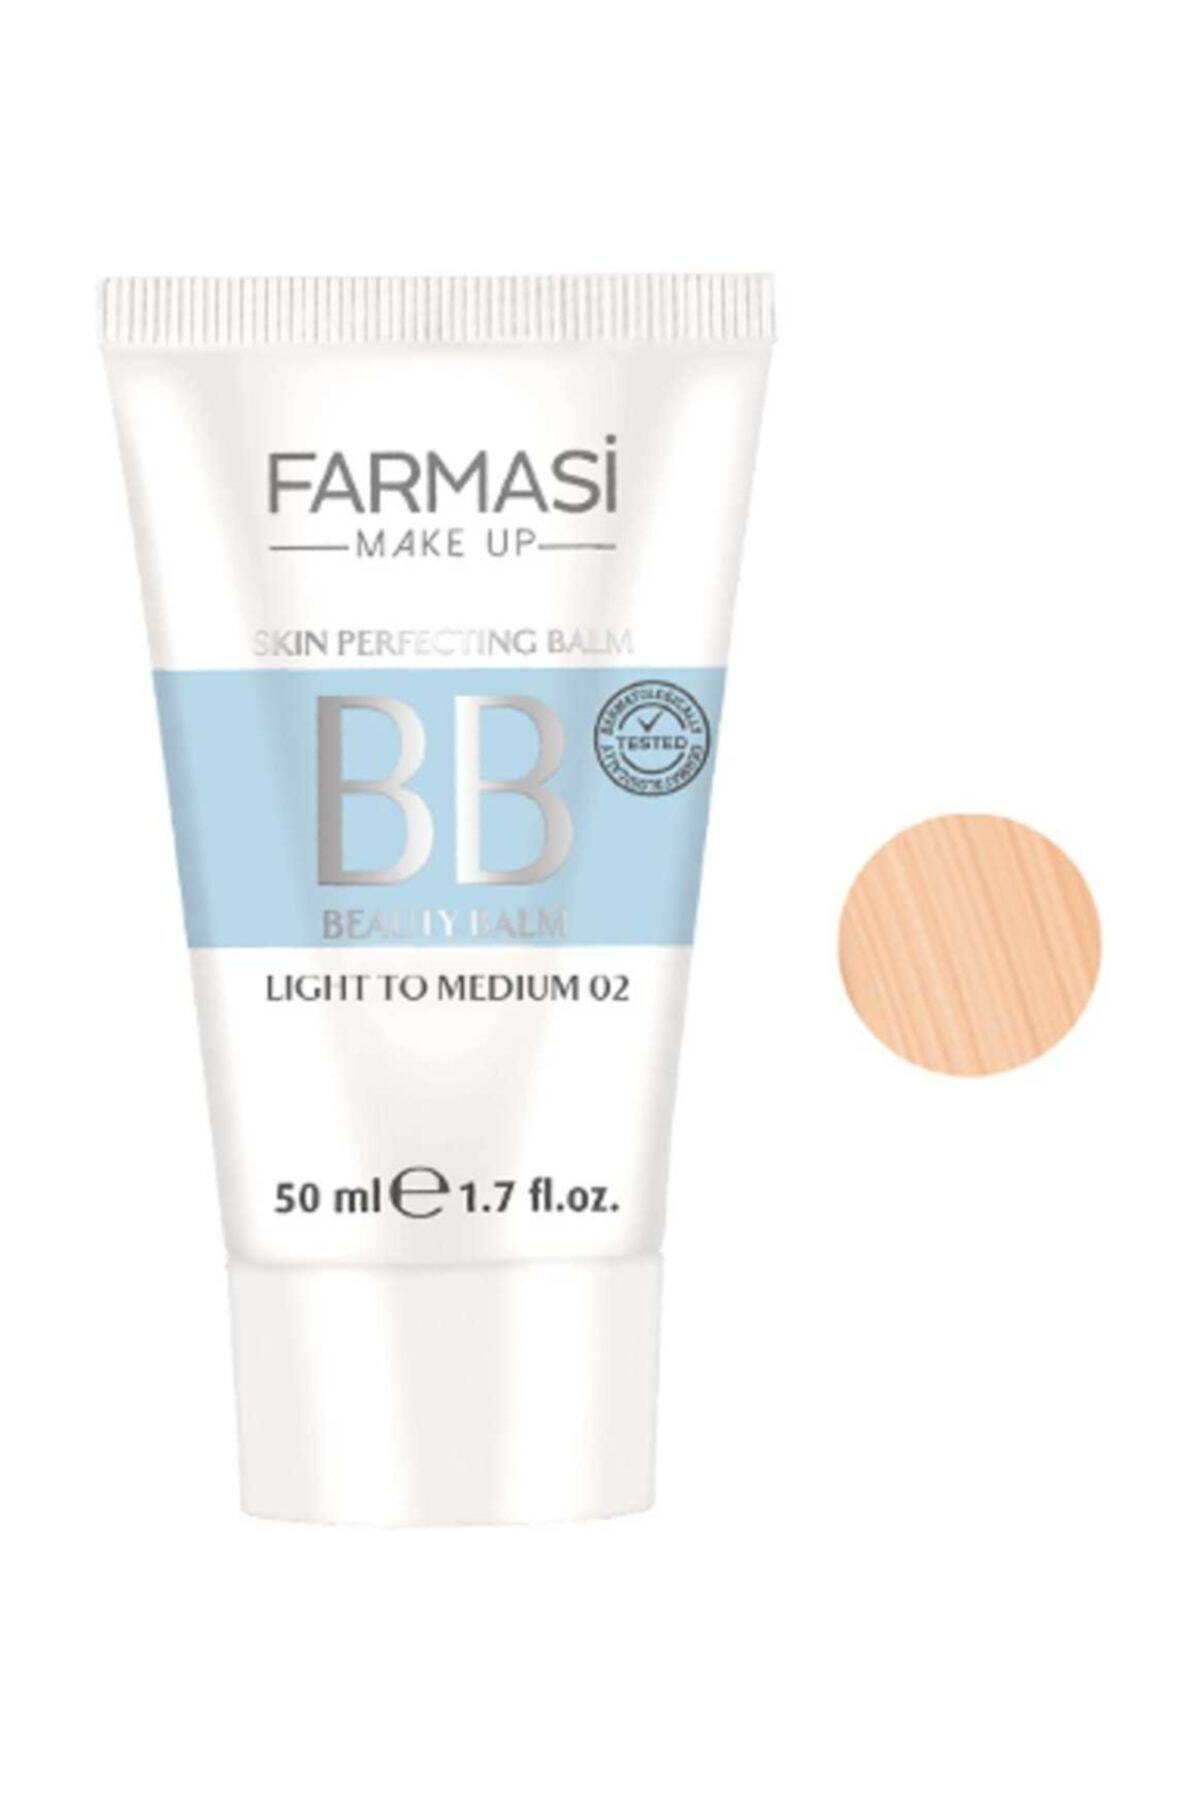 Farmasi Bb Krem - All In One Açıktan Ortaya 02 50 ml 8690131764005 1